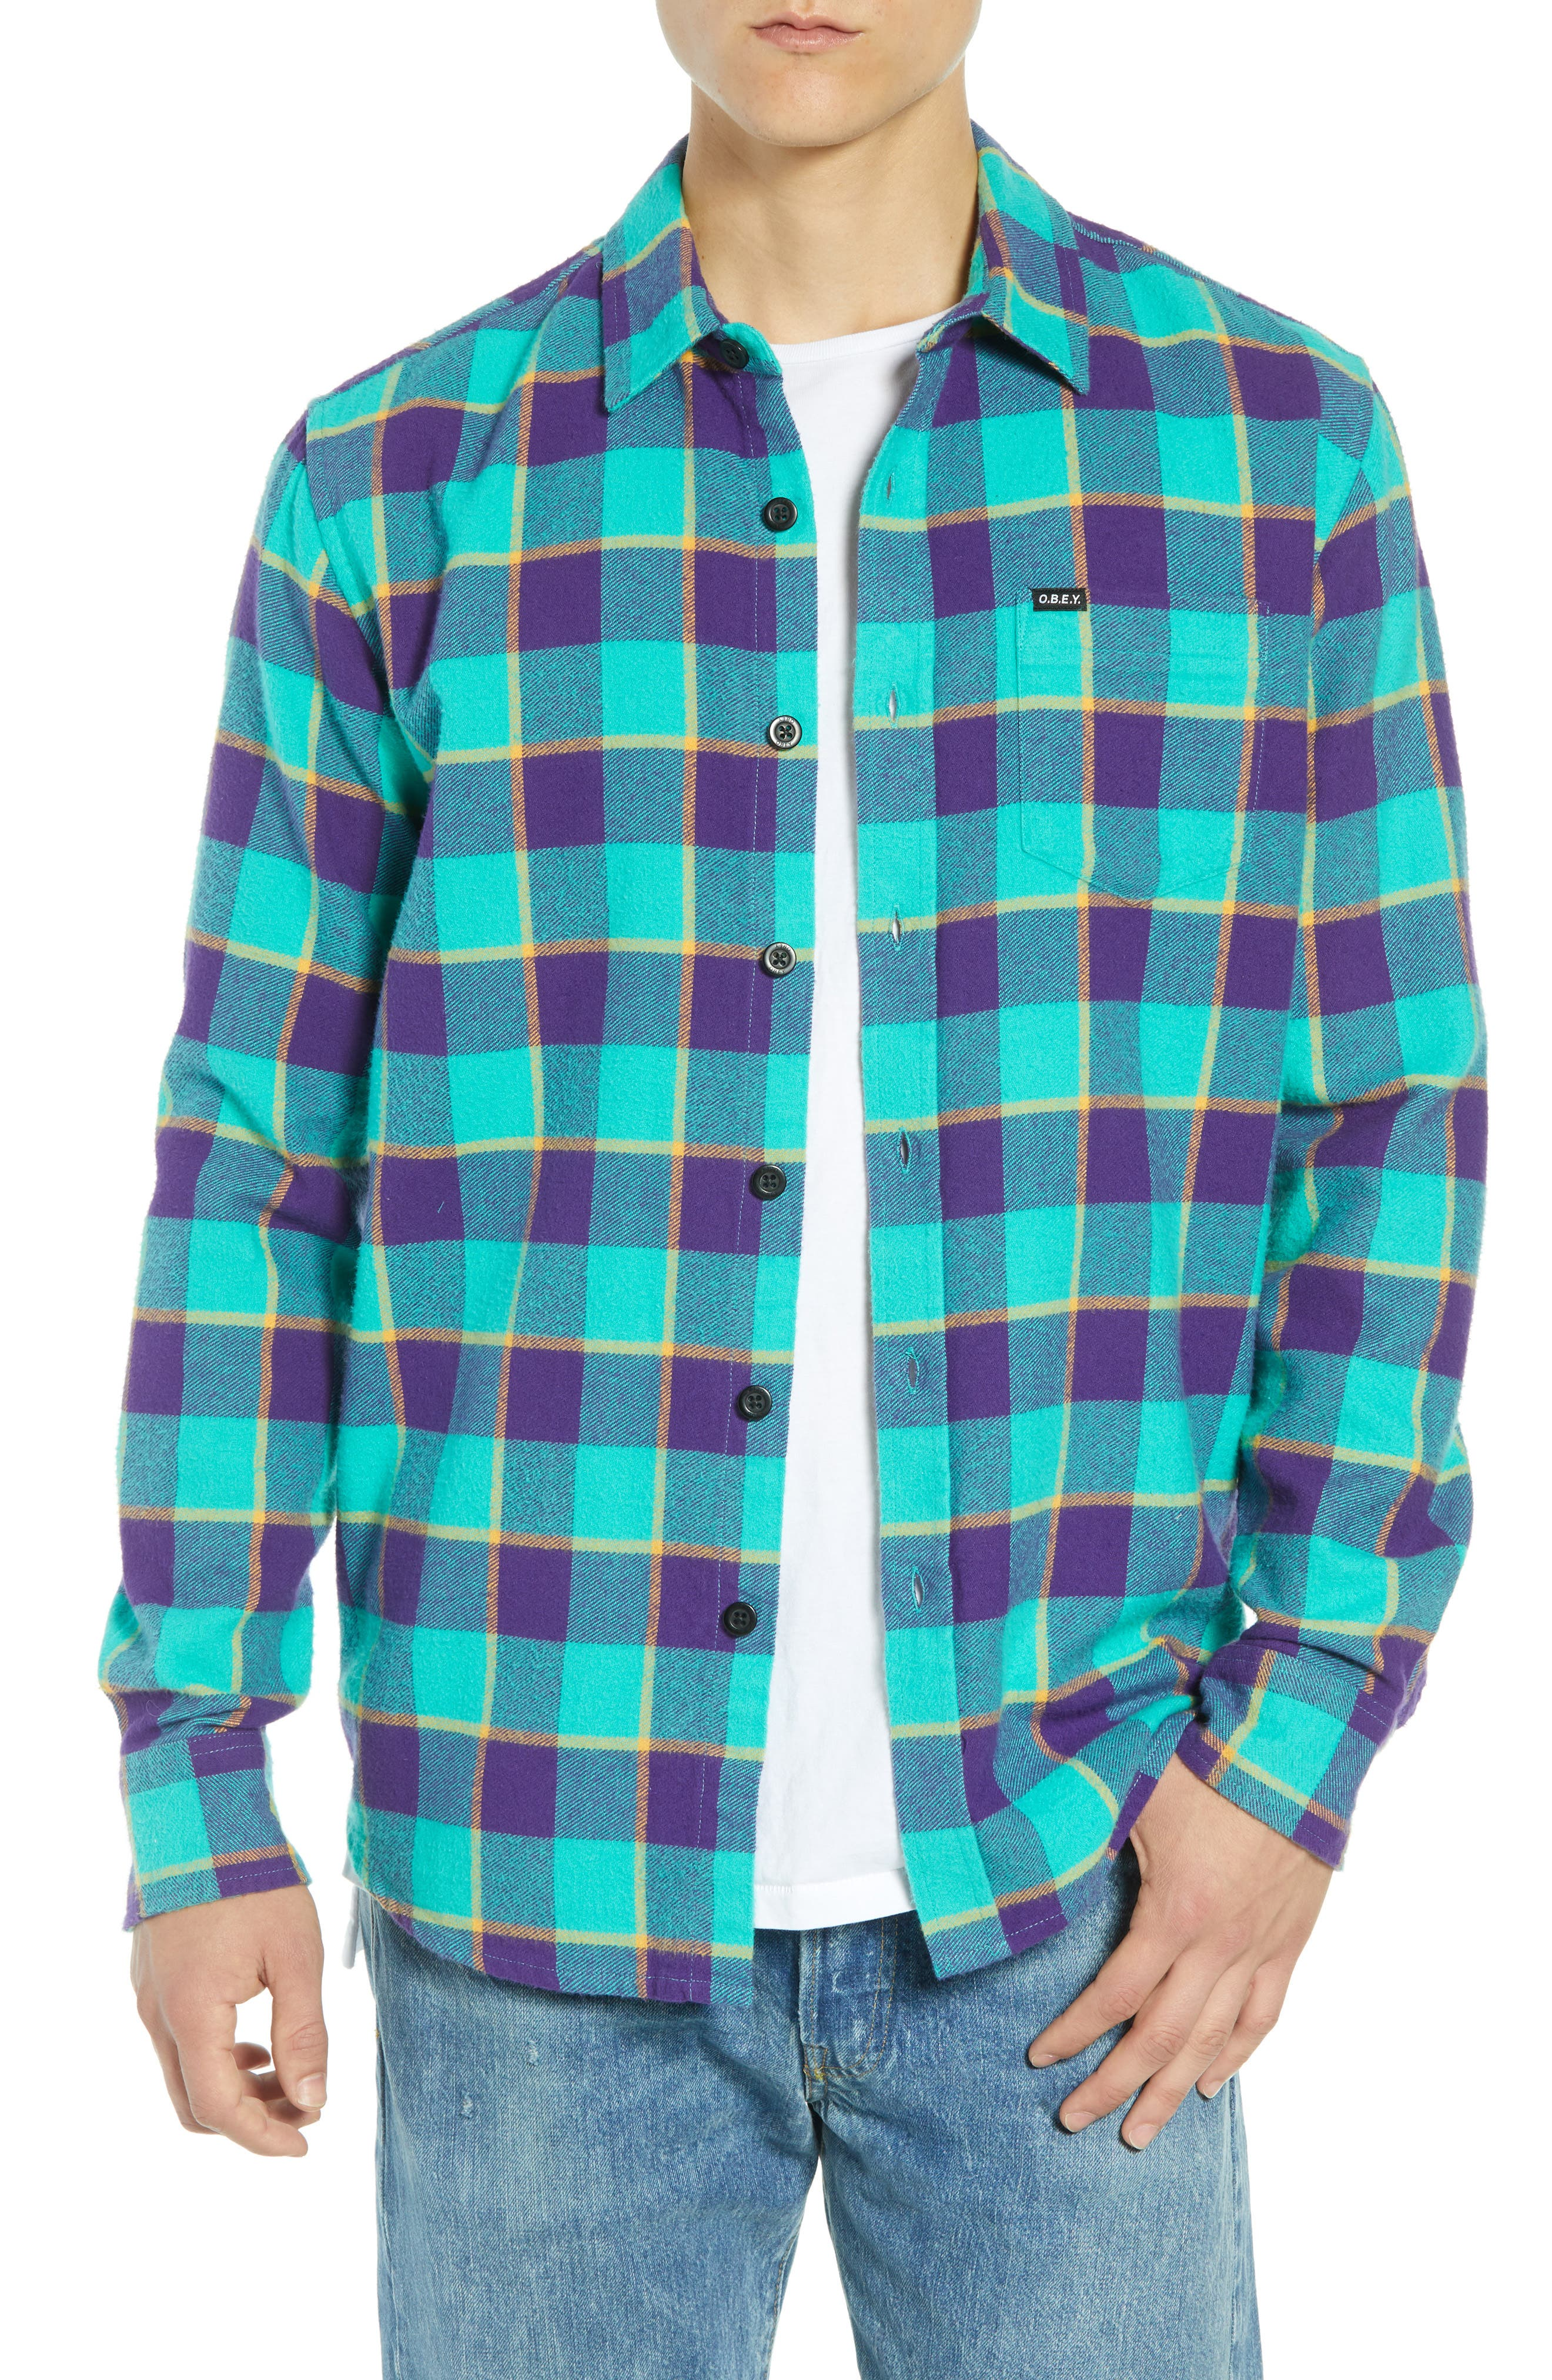 Ventura Plaid Flannel Shirt,                             Main thumbnail 1, color,                             TEAL MULTI